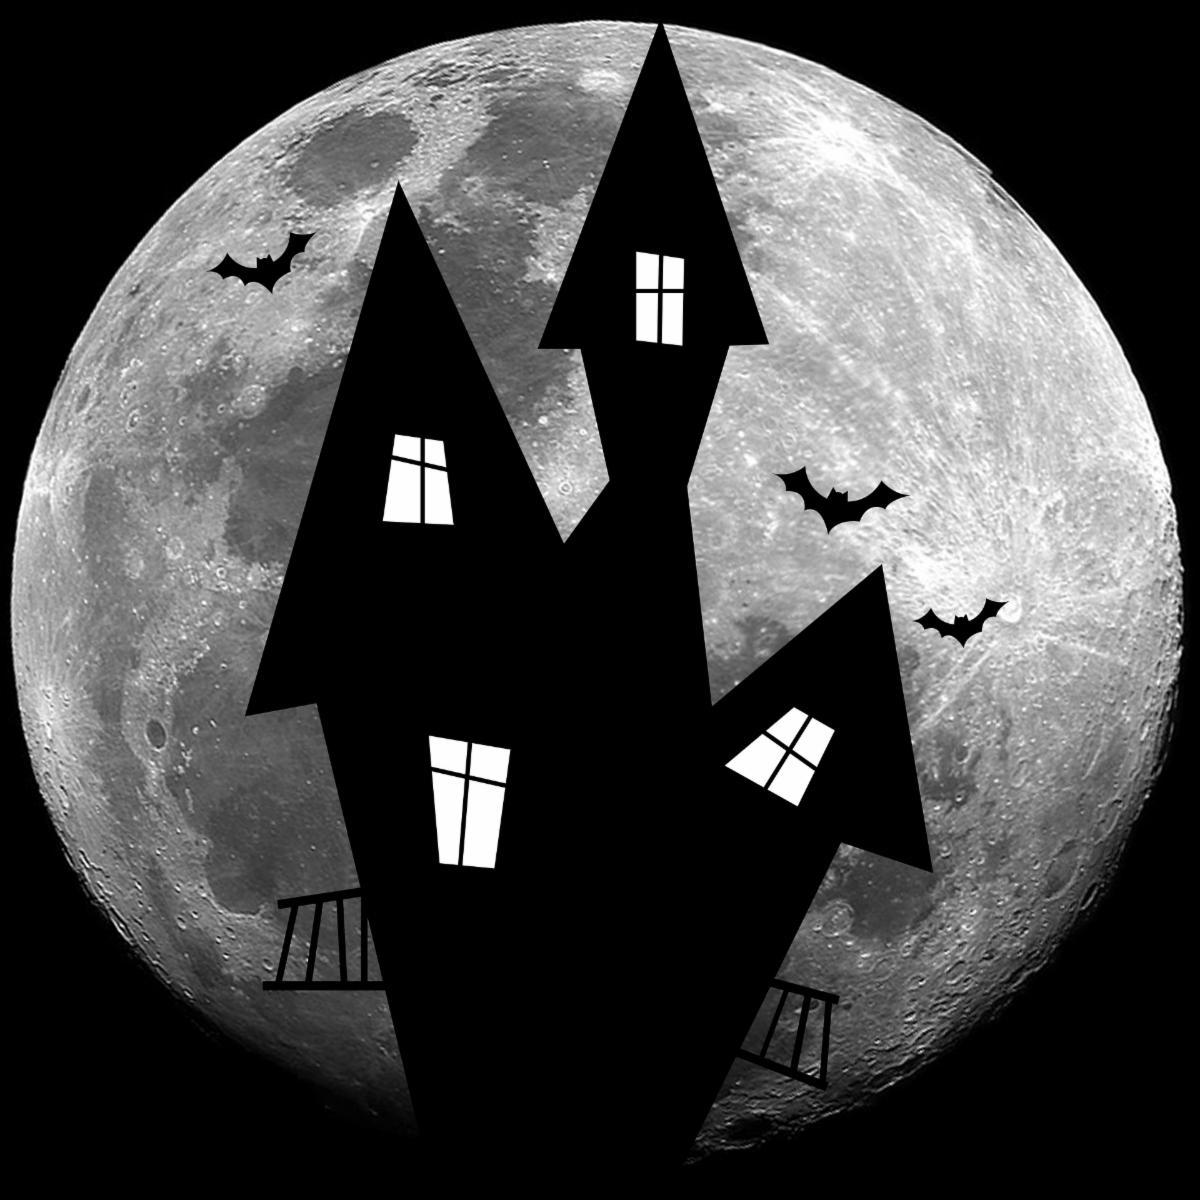 the-haunted-house-2823317_1920.jpg